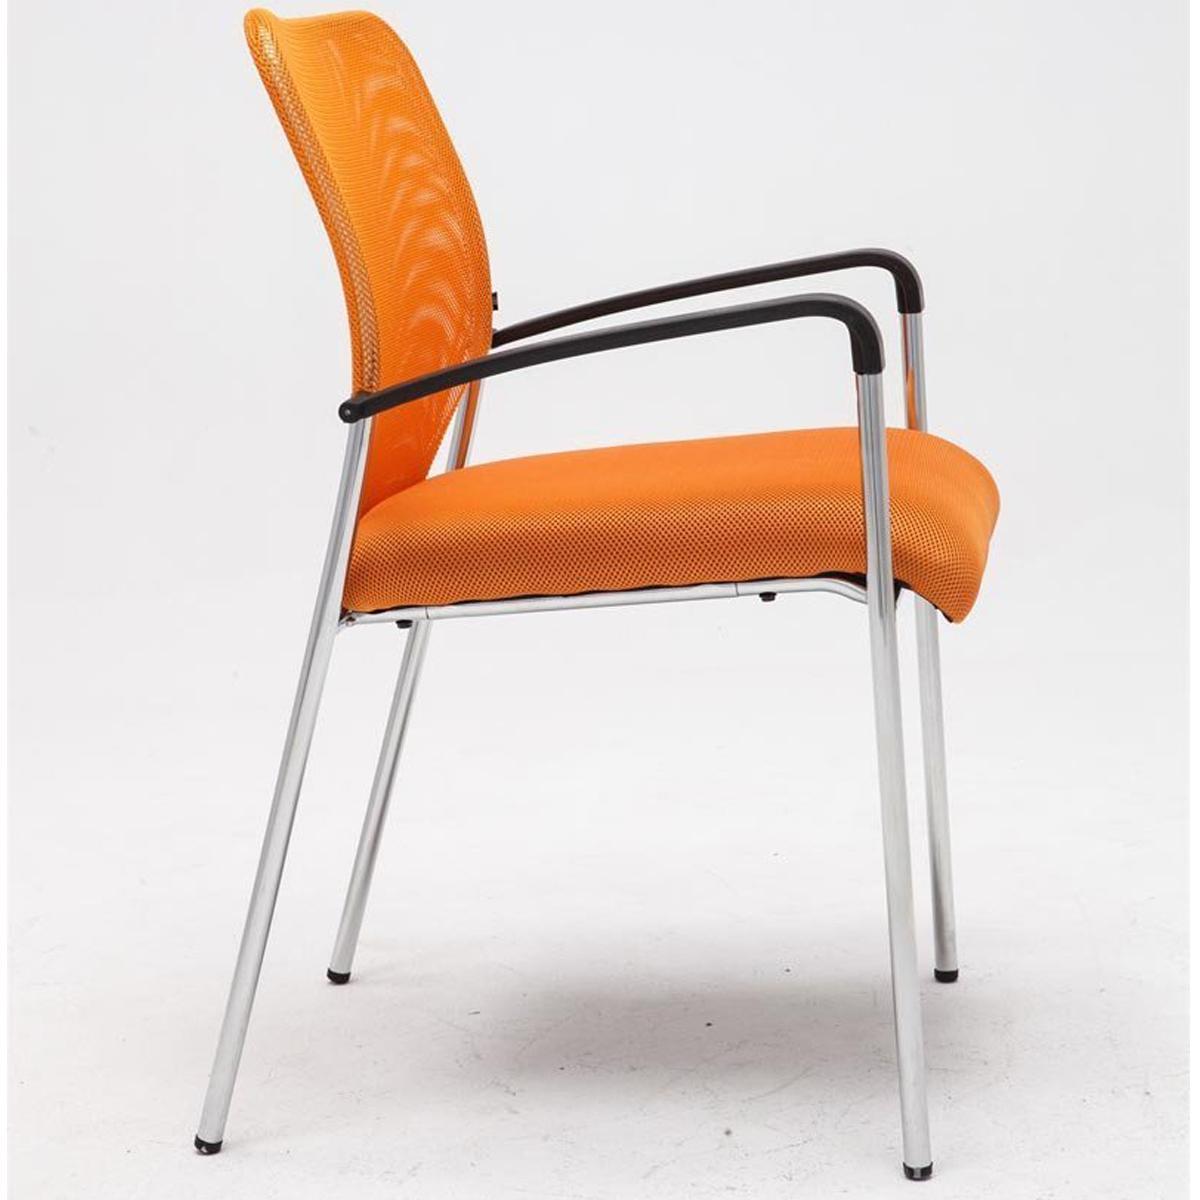 Sedie Per Sala Dattesa.Sedia Sala D Attesa Jamaica Tessuto A Rete Arancione